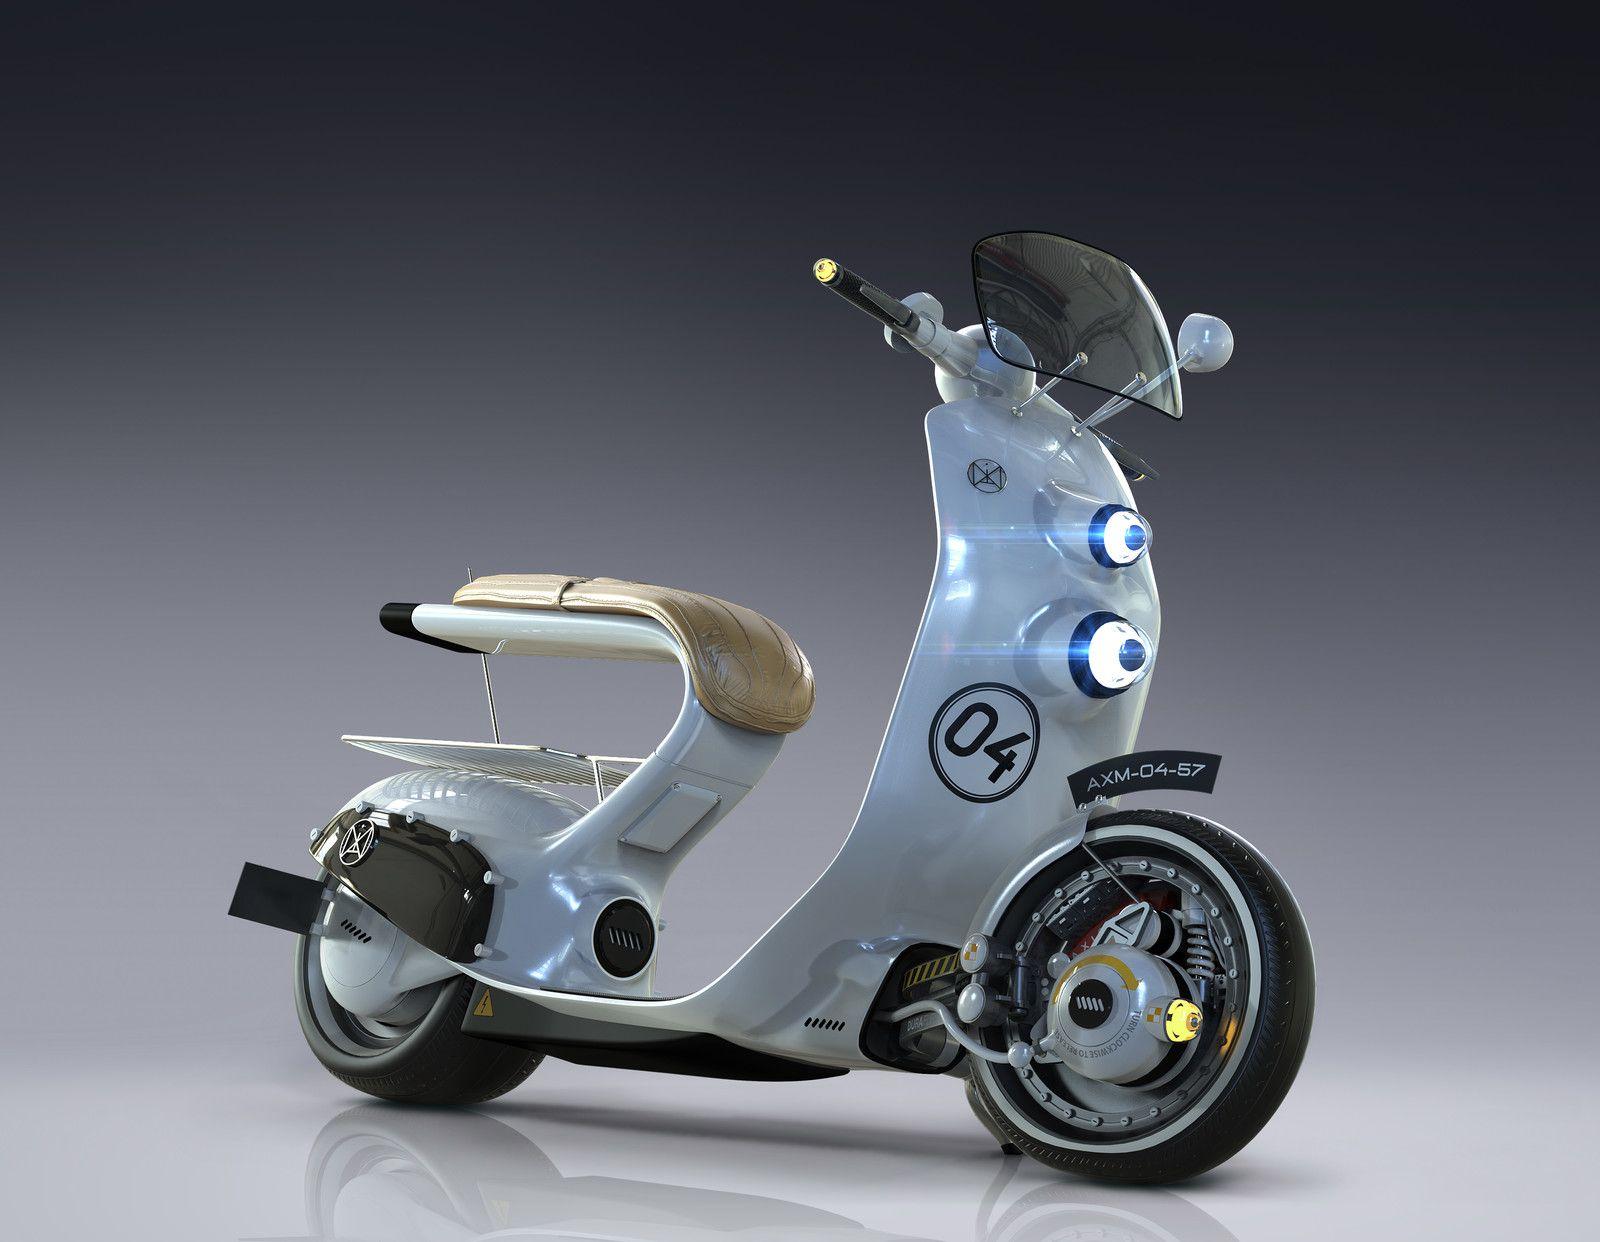 Axm 4 Scooter Igor Sobolevsky Scooter Design Scooter Bike Scooter